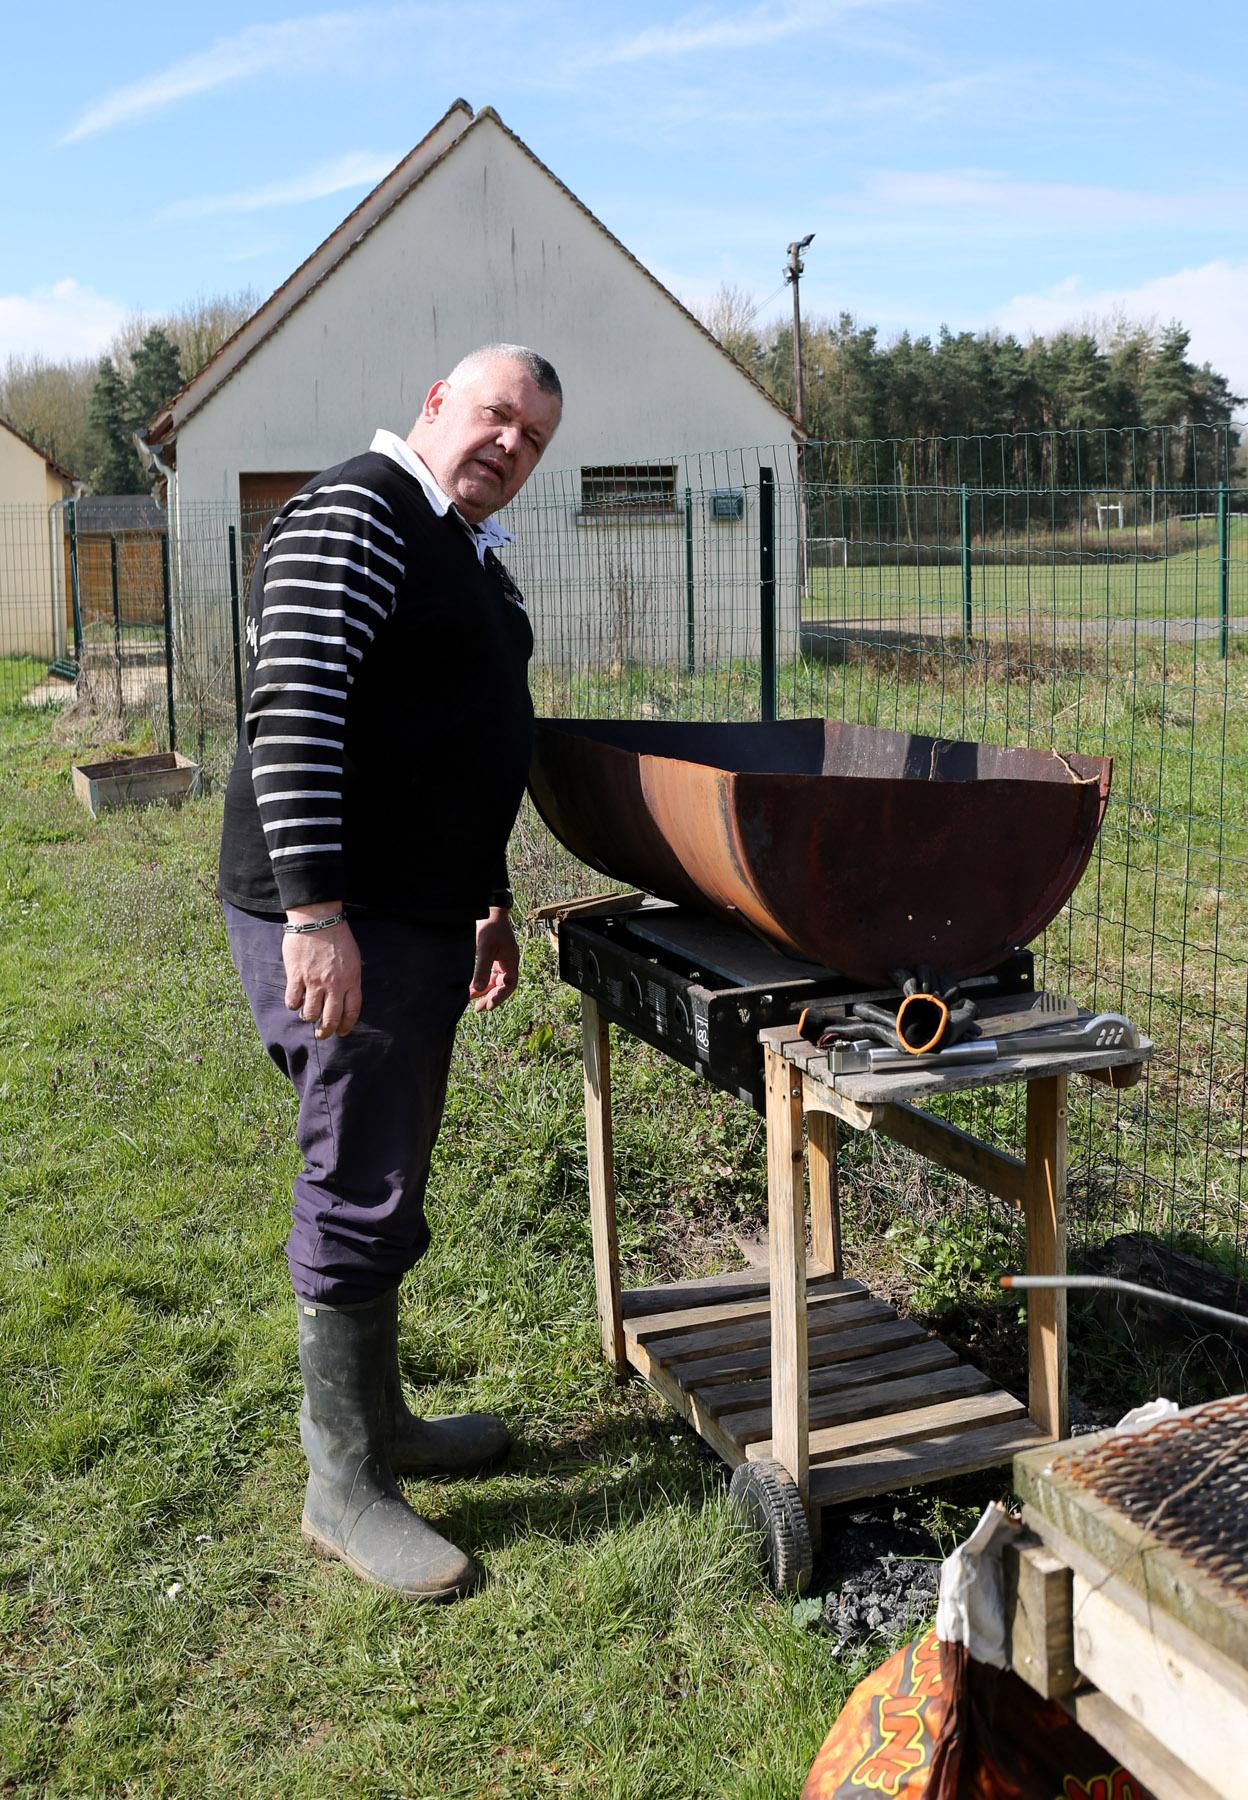 J-C à l'allumage du barbecue